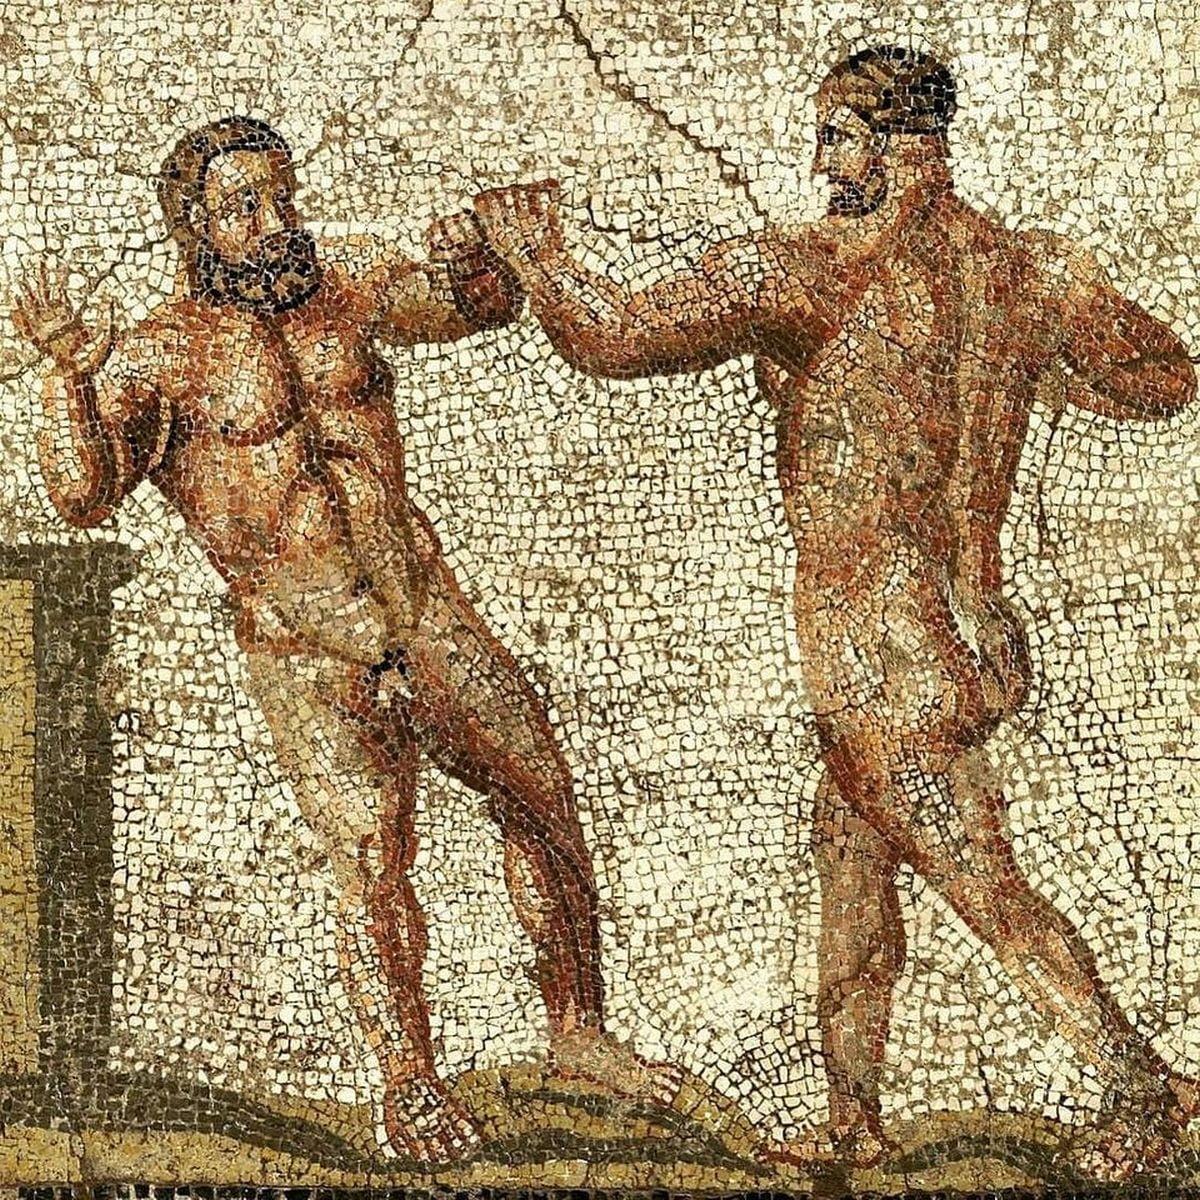 Rzymska mozaika ze sportowcami. Datowane na I n.e.